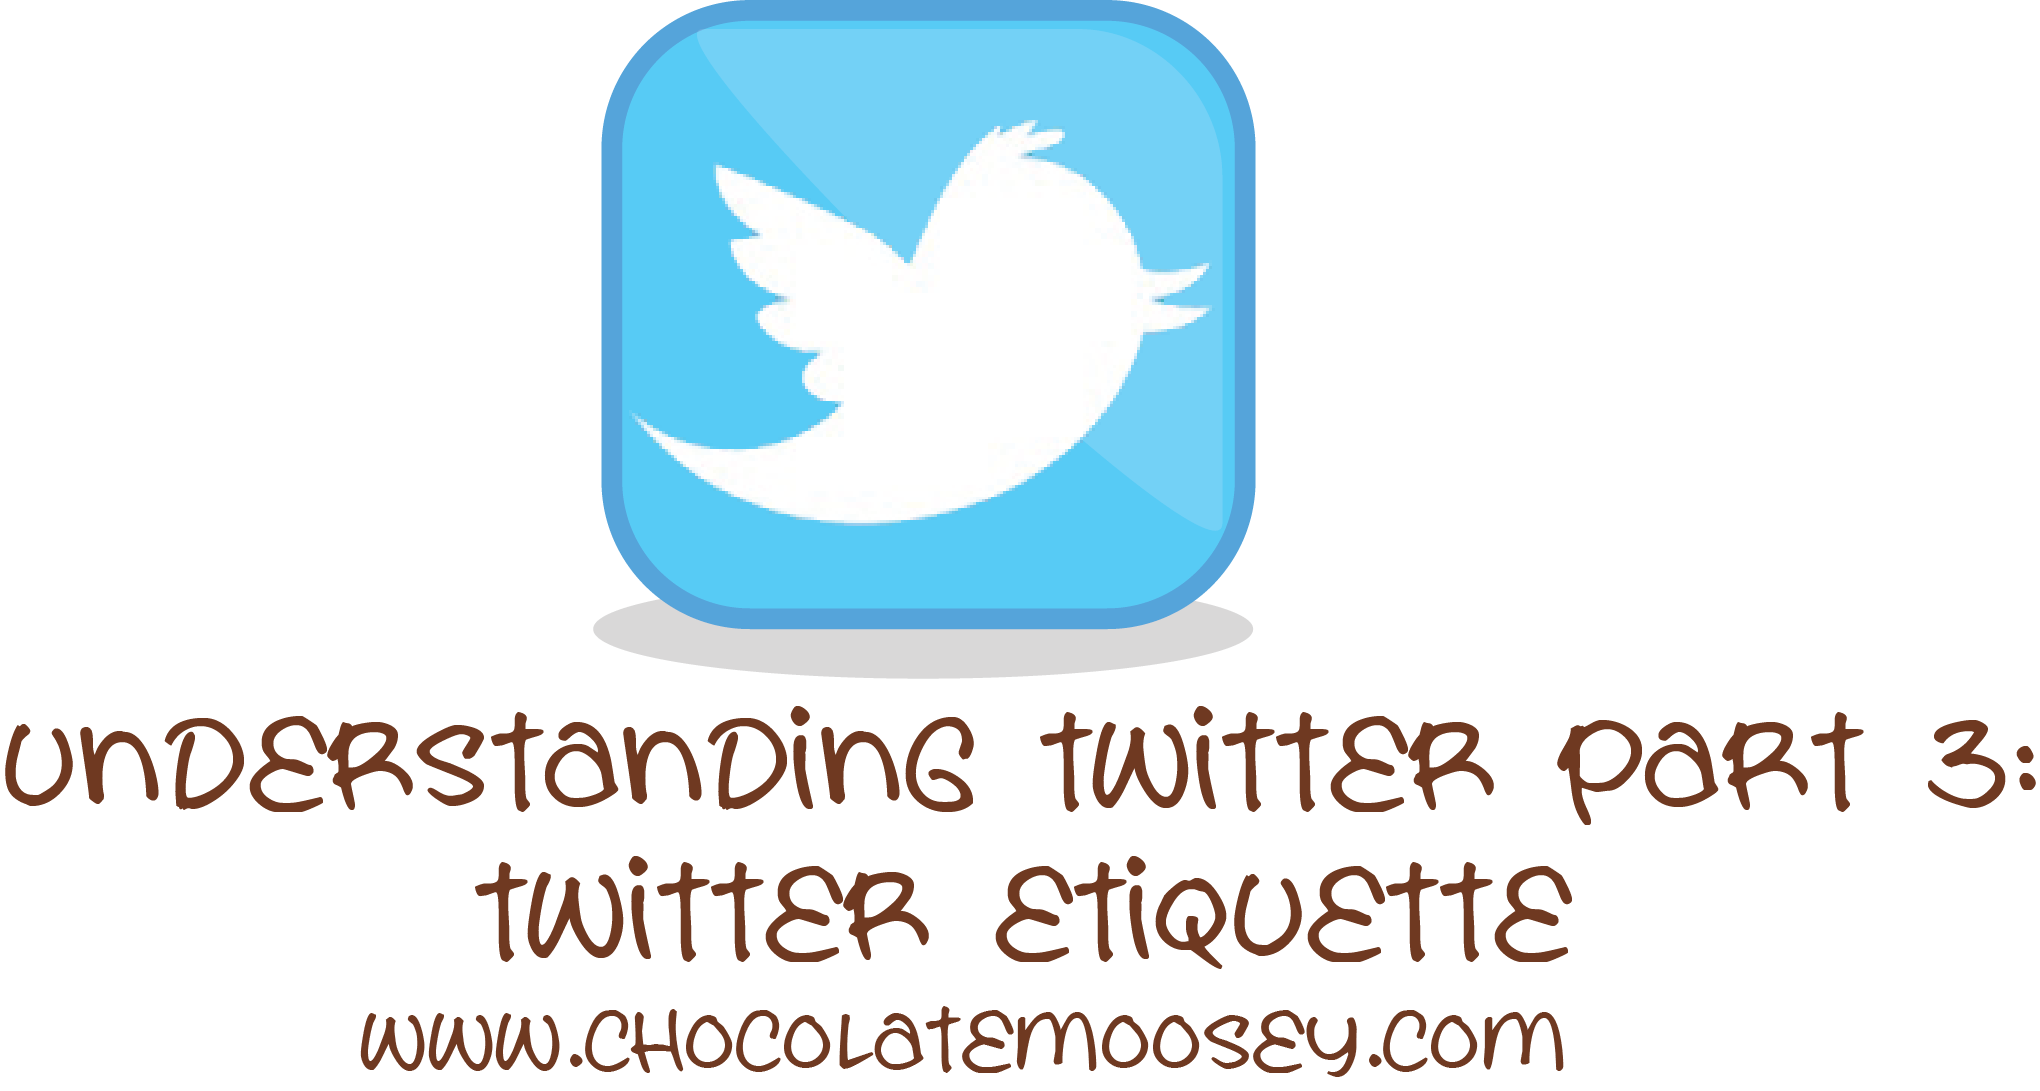 Understanding Twitter Part 3 – Twitter Etiquette